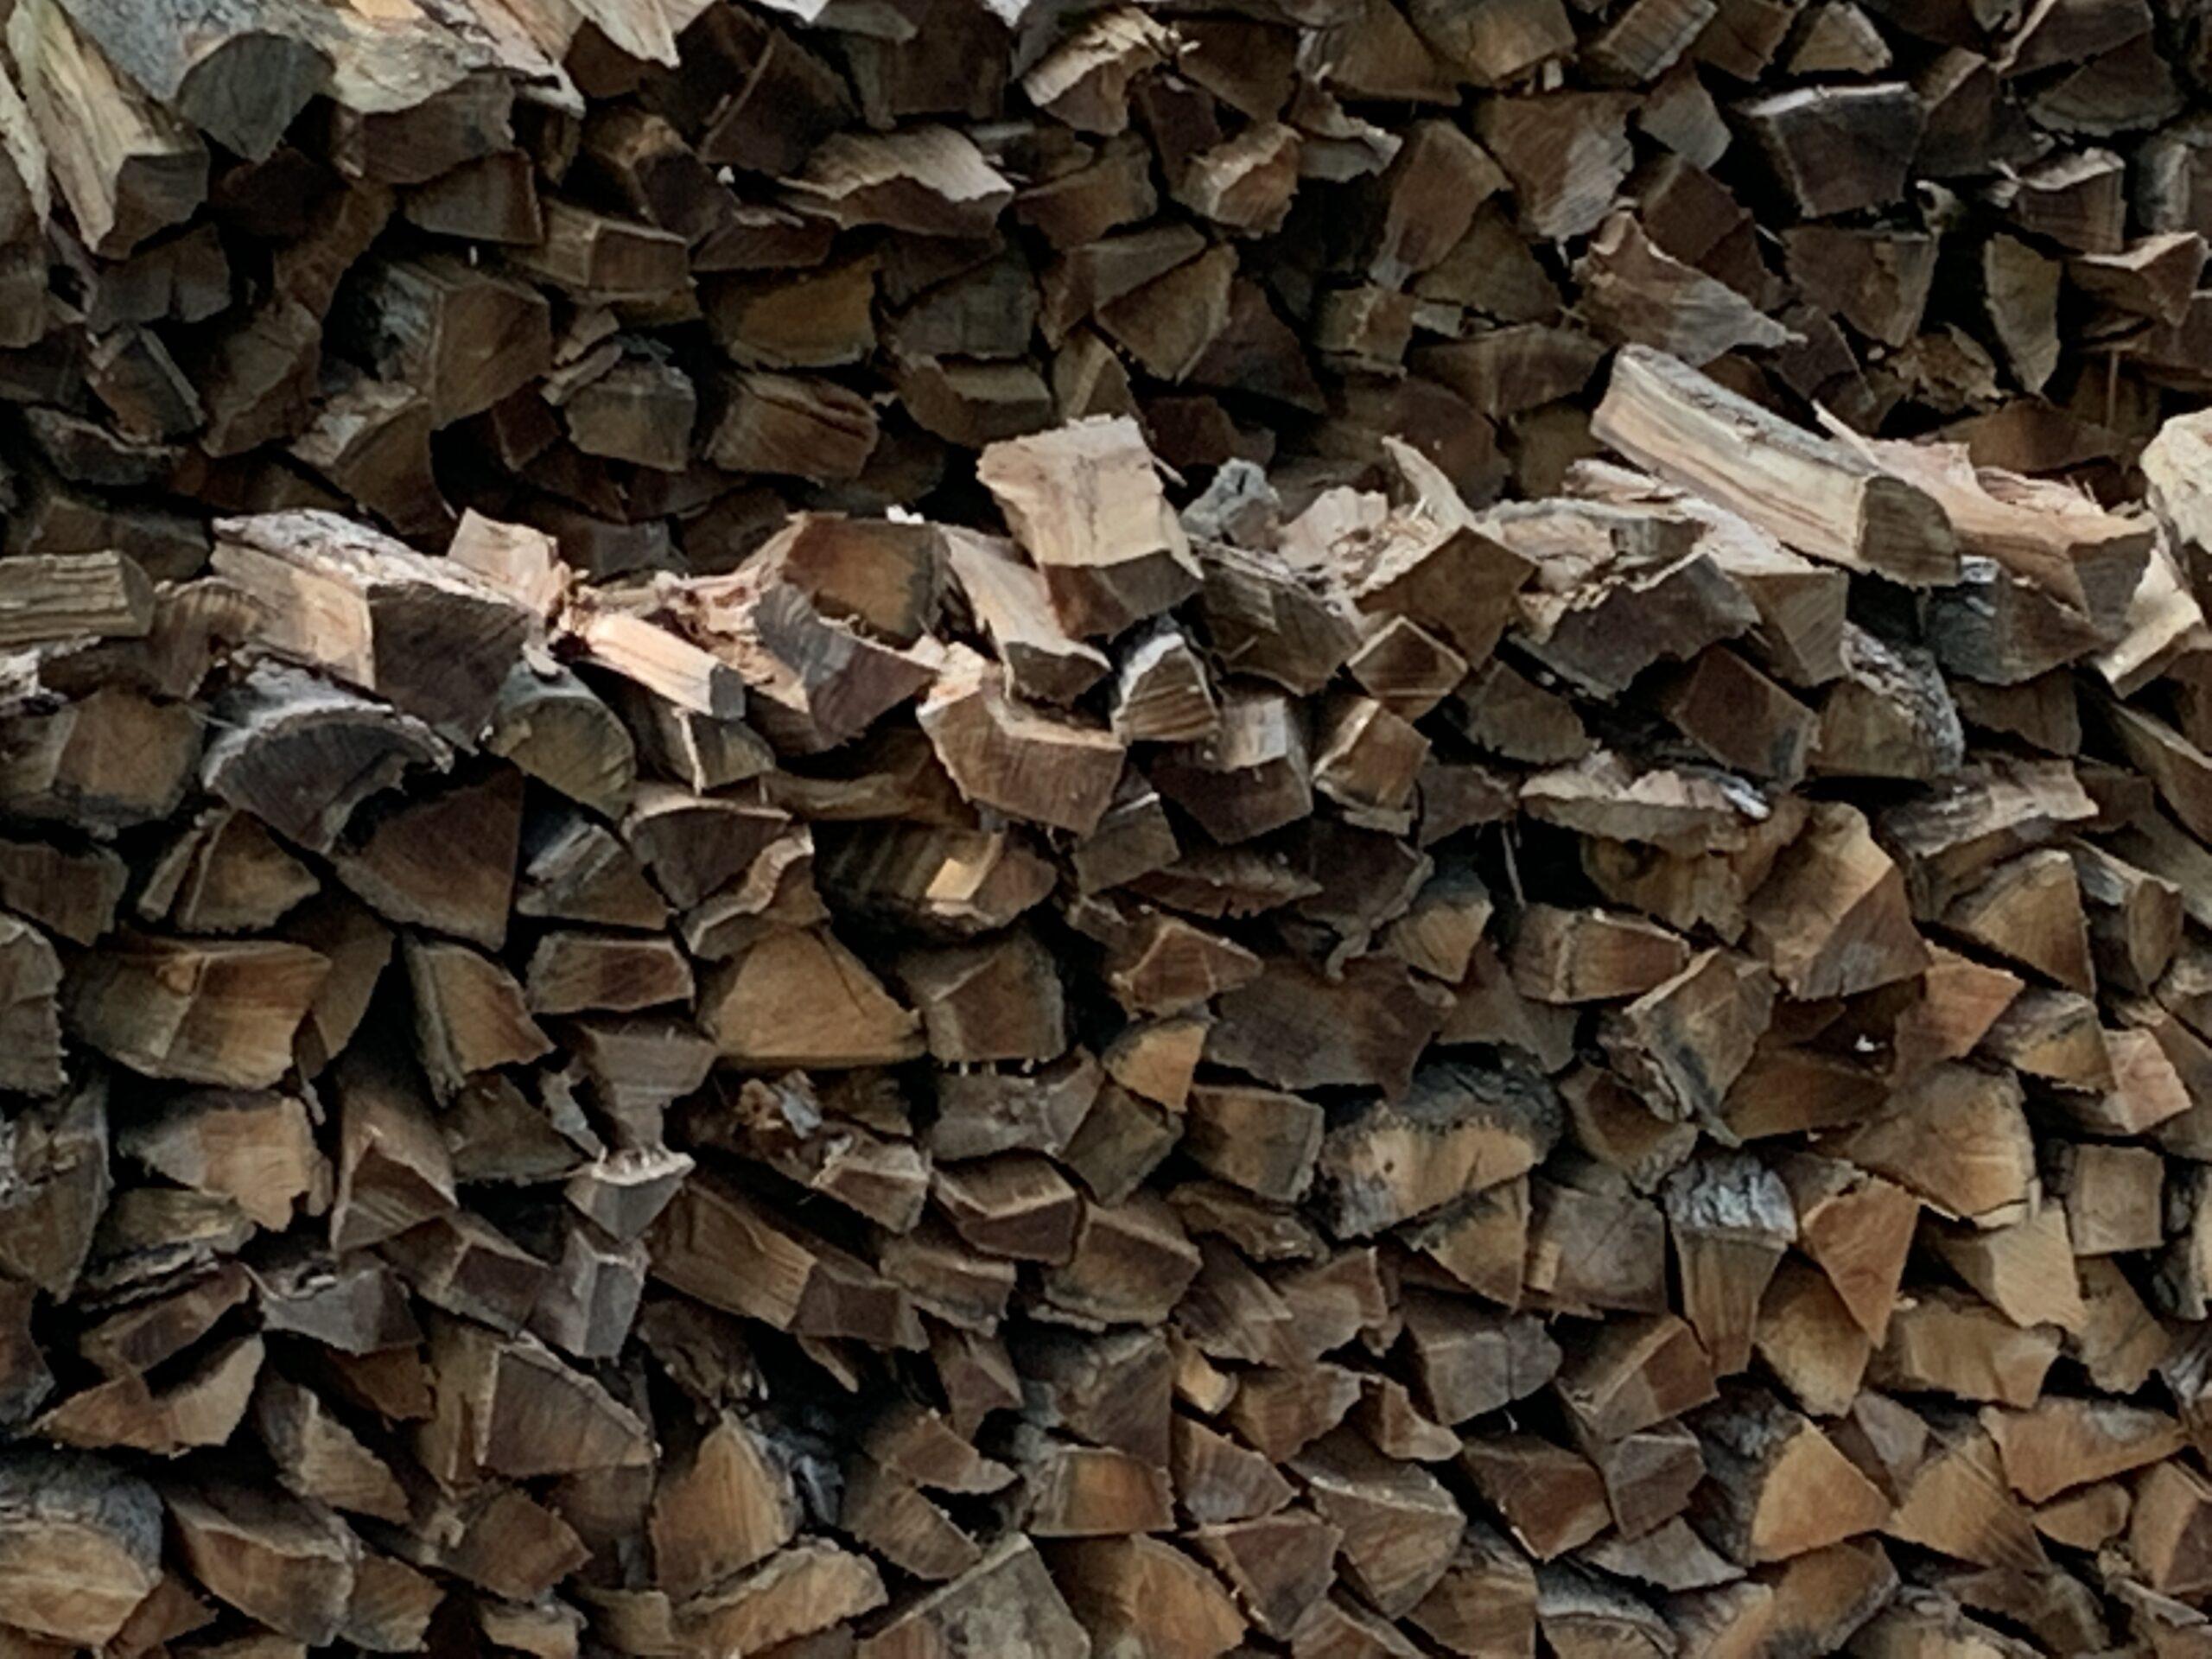 Mixed Hardwood Firewood 11079 scaled - English Gardens Orchard Lake Road West Bloomfield Township Mi